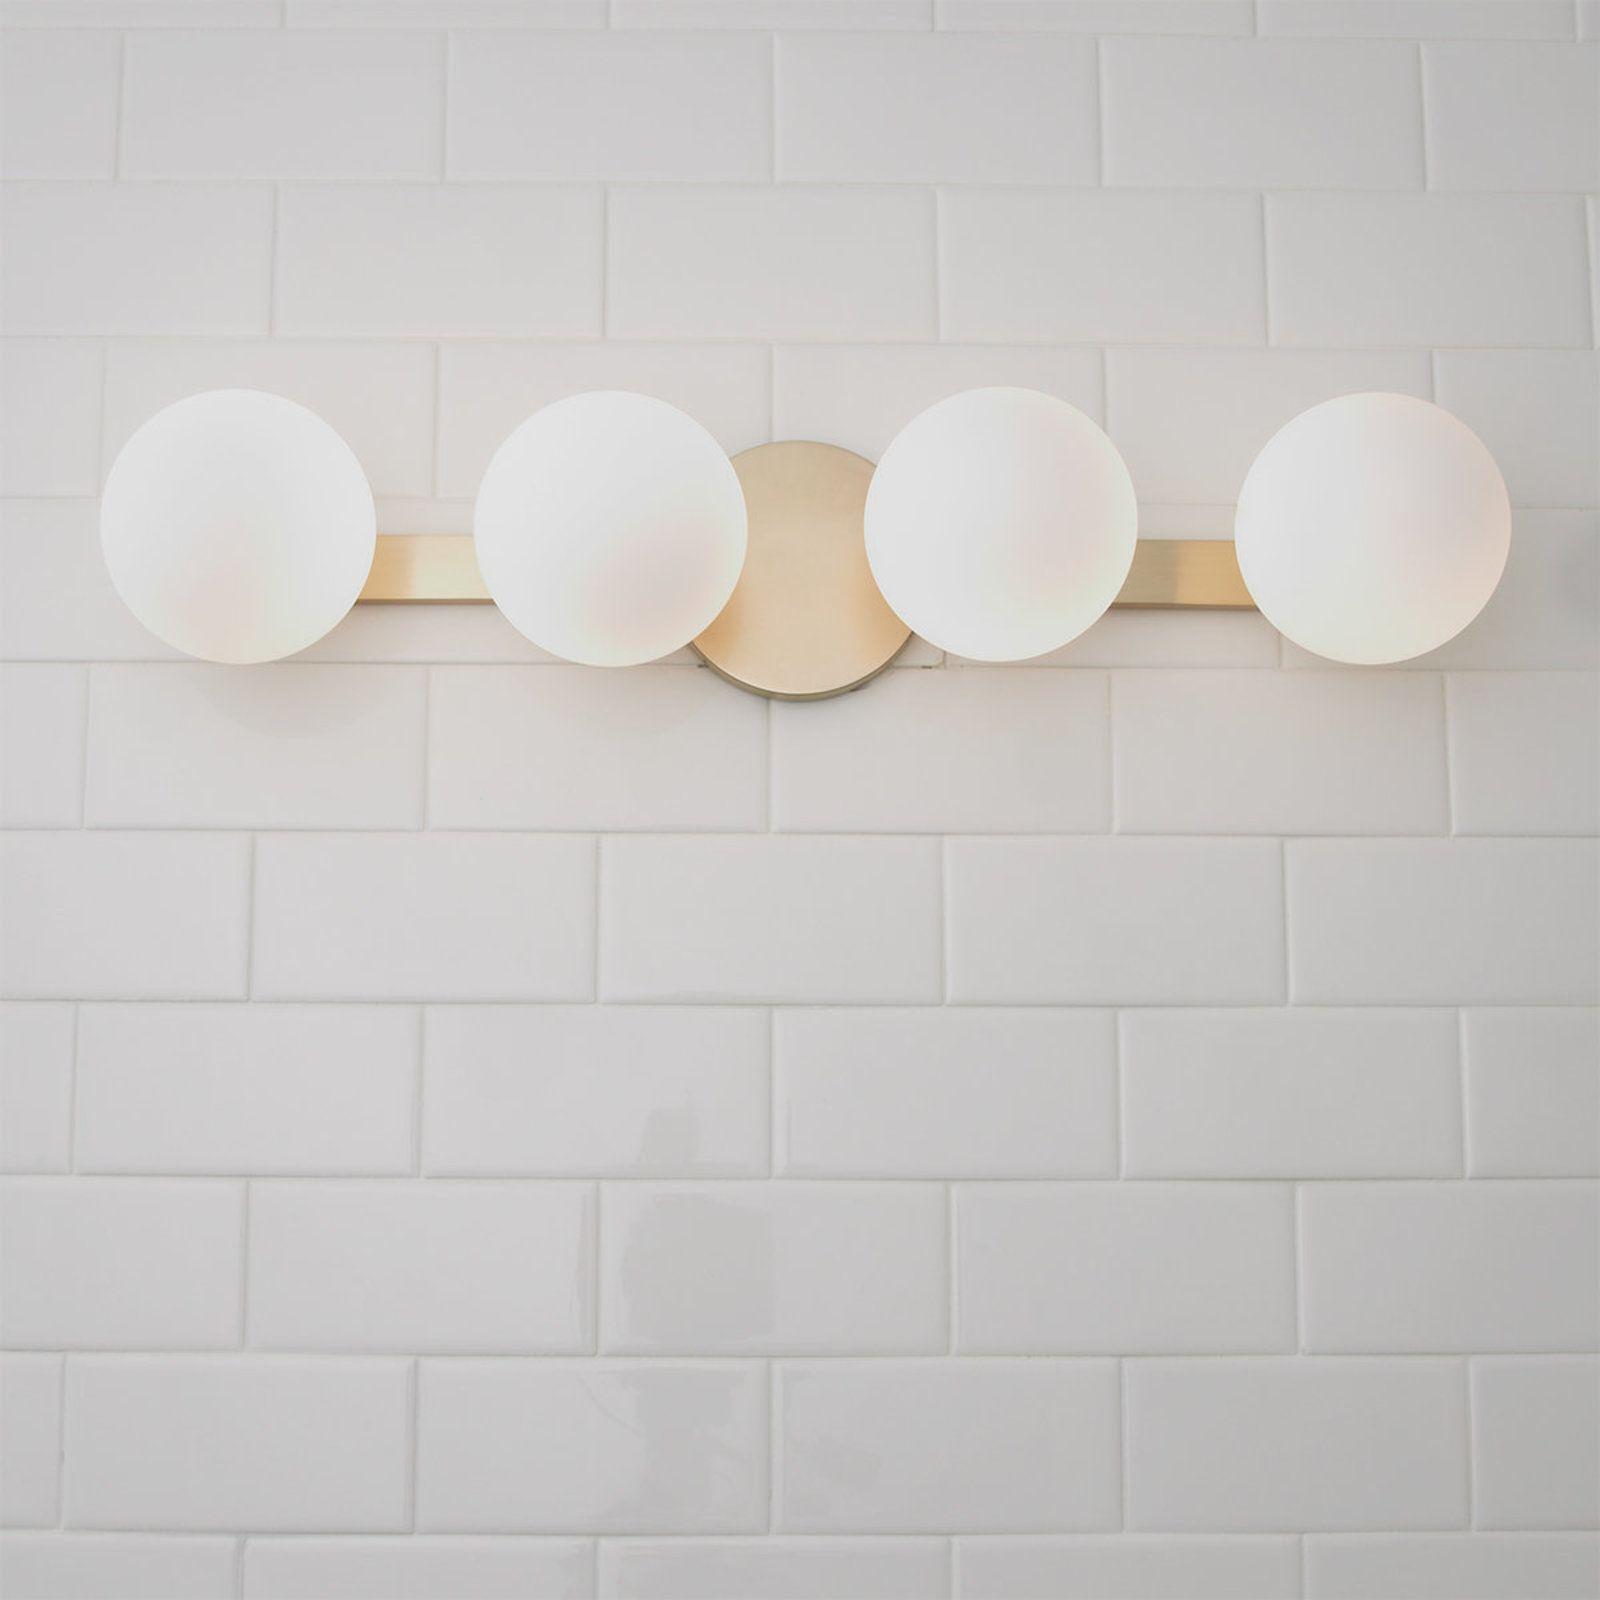 Pin By Kiki N On Bathroom Master Vanity Lighting Wall Mounted Light Light